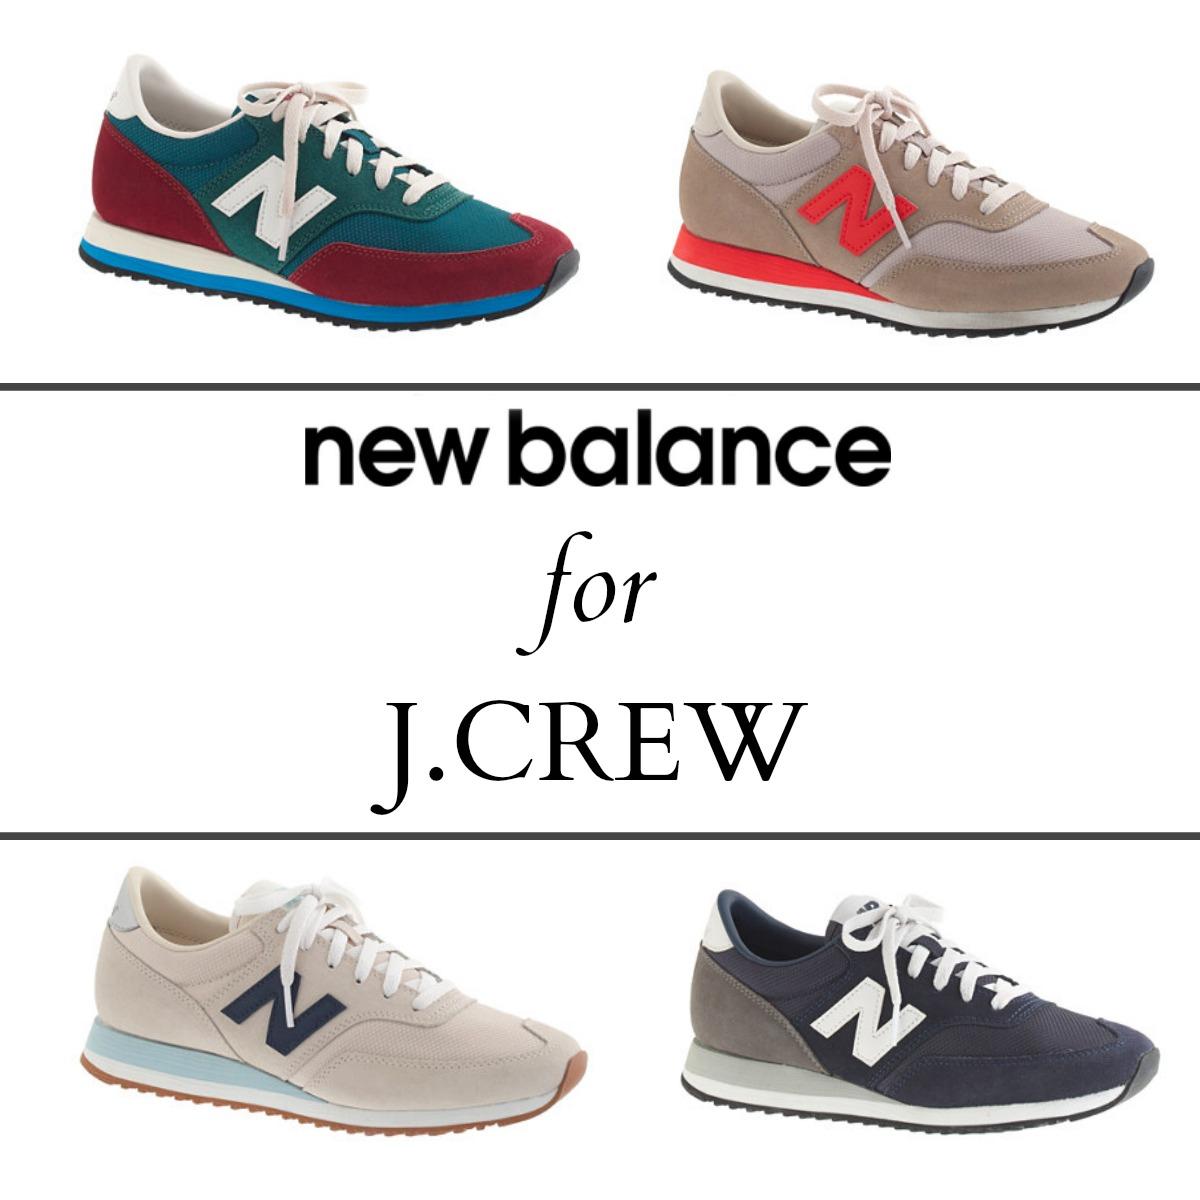 j crew new balance 620 women